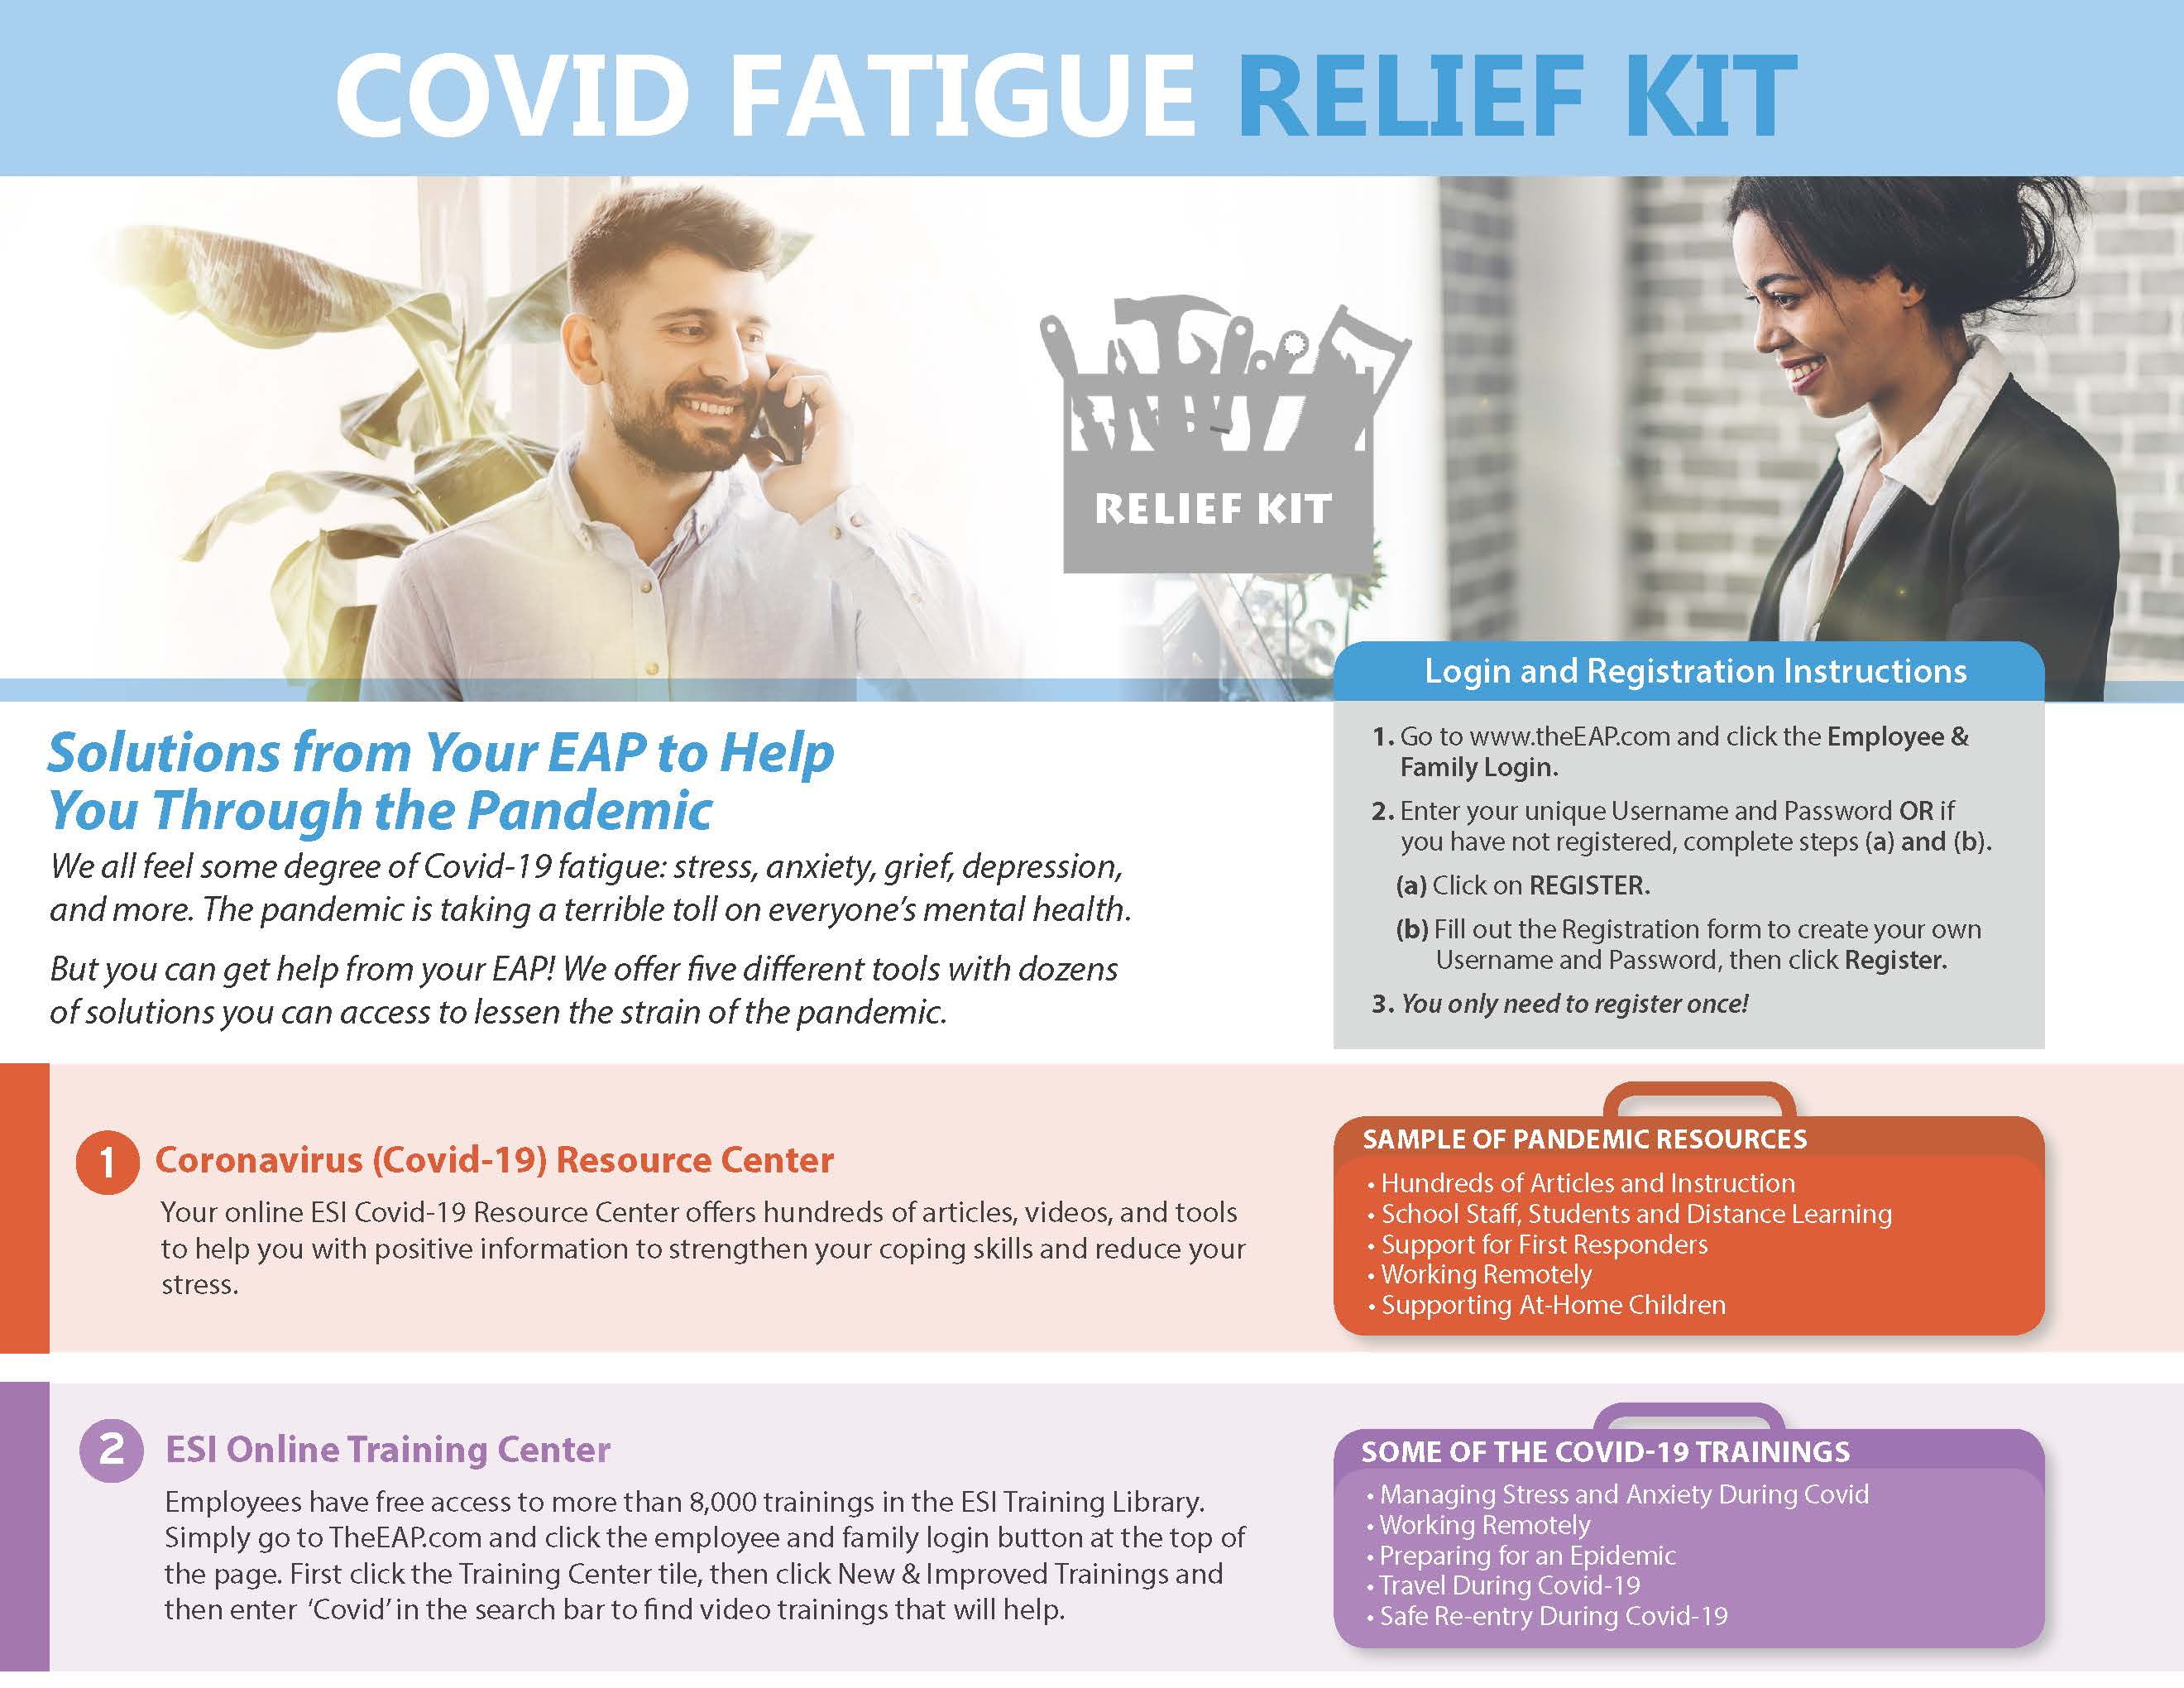 COVID Fatigue Relief Kit